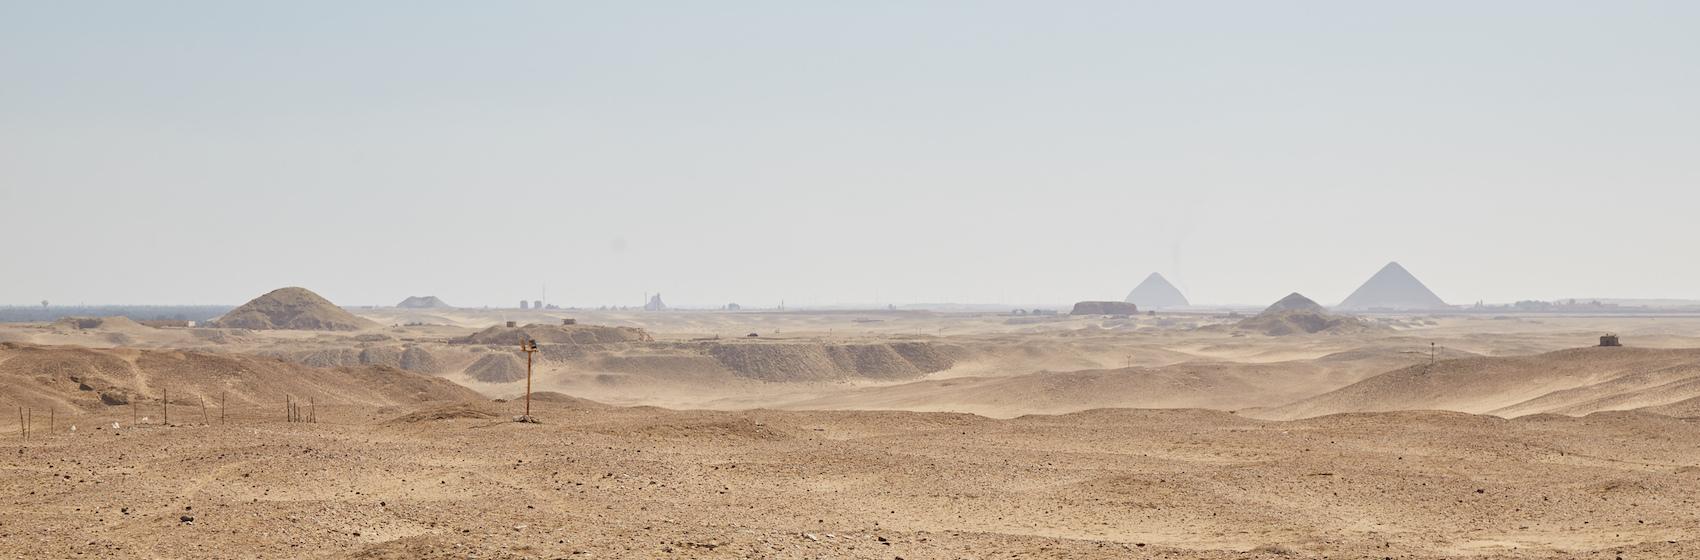 South Saqqara Pyramids